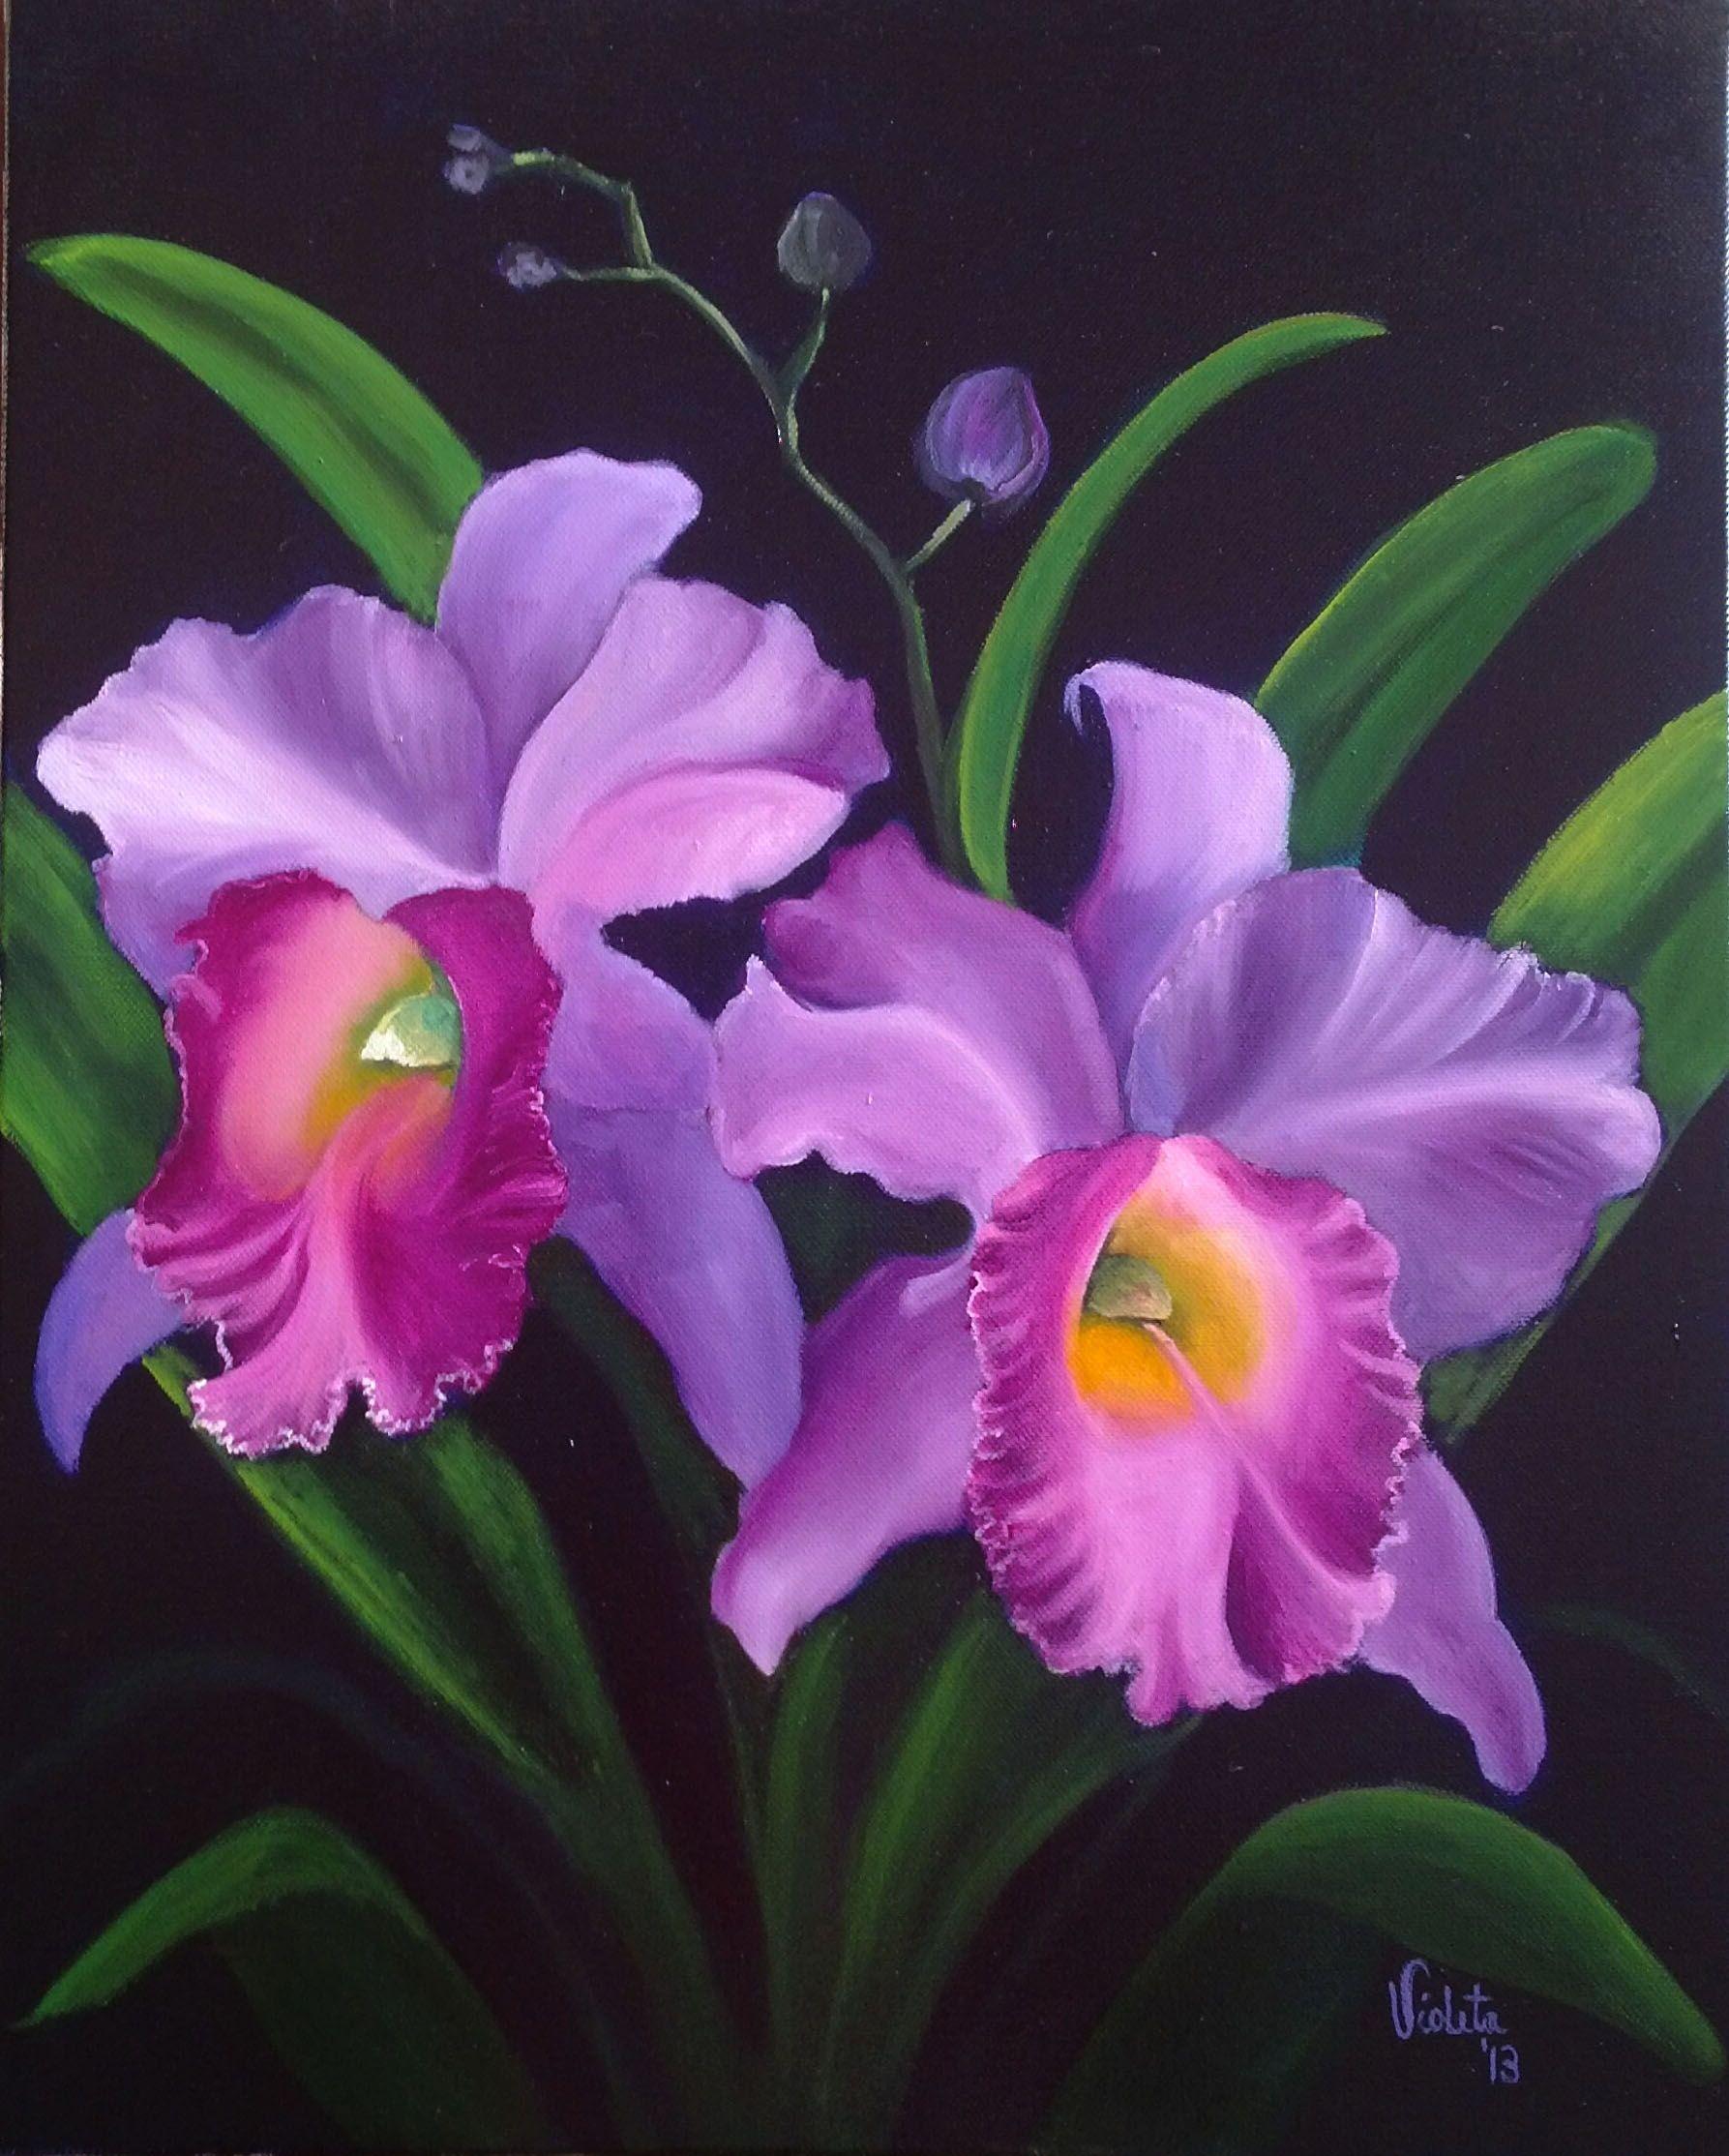 orquideas al oleo - Buscar con Google | Óleo | Pinterest | Buscar ...